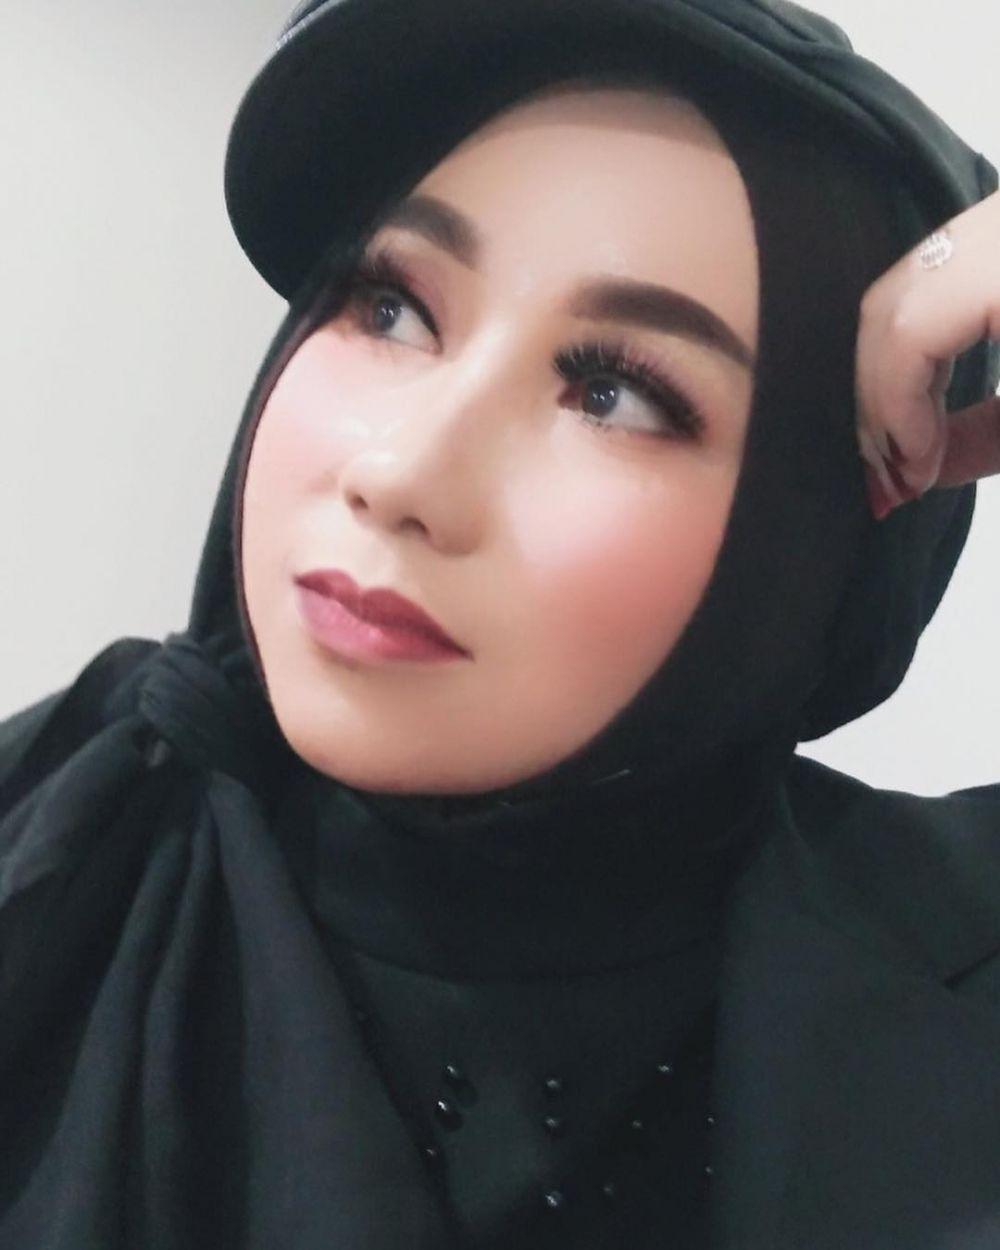 potret upiak mengenakan hijab © 2019 brilio.net